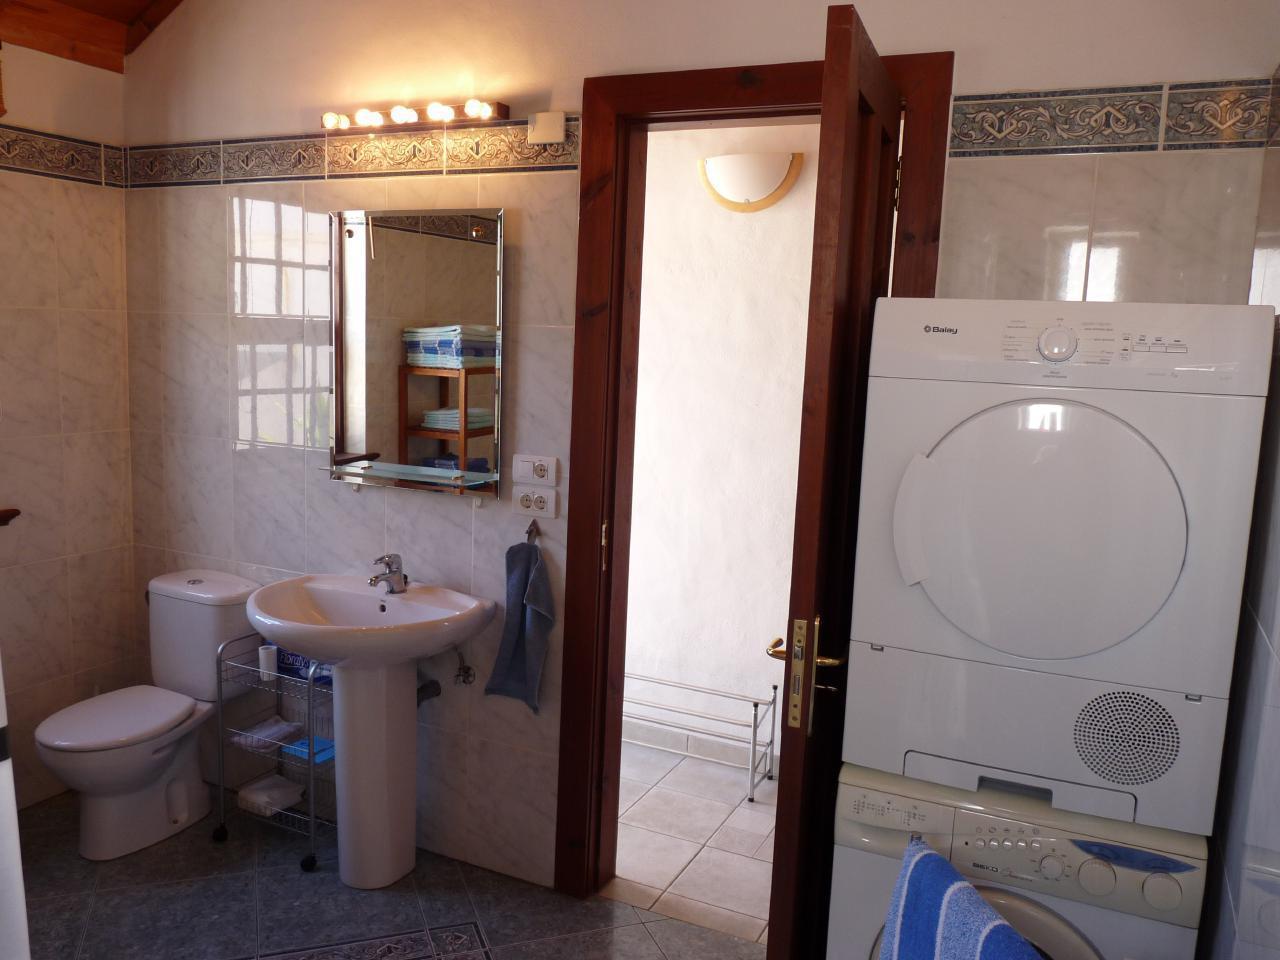 Ferienhaus FINCA TOPO DEL DRAGO (224349), Puntagorda, La Palma, Kanarische Inseln, Spanien, Bild 21